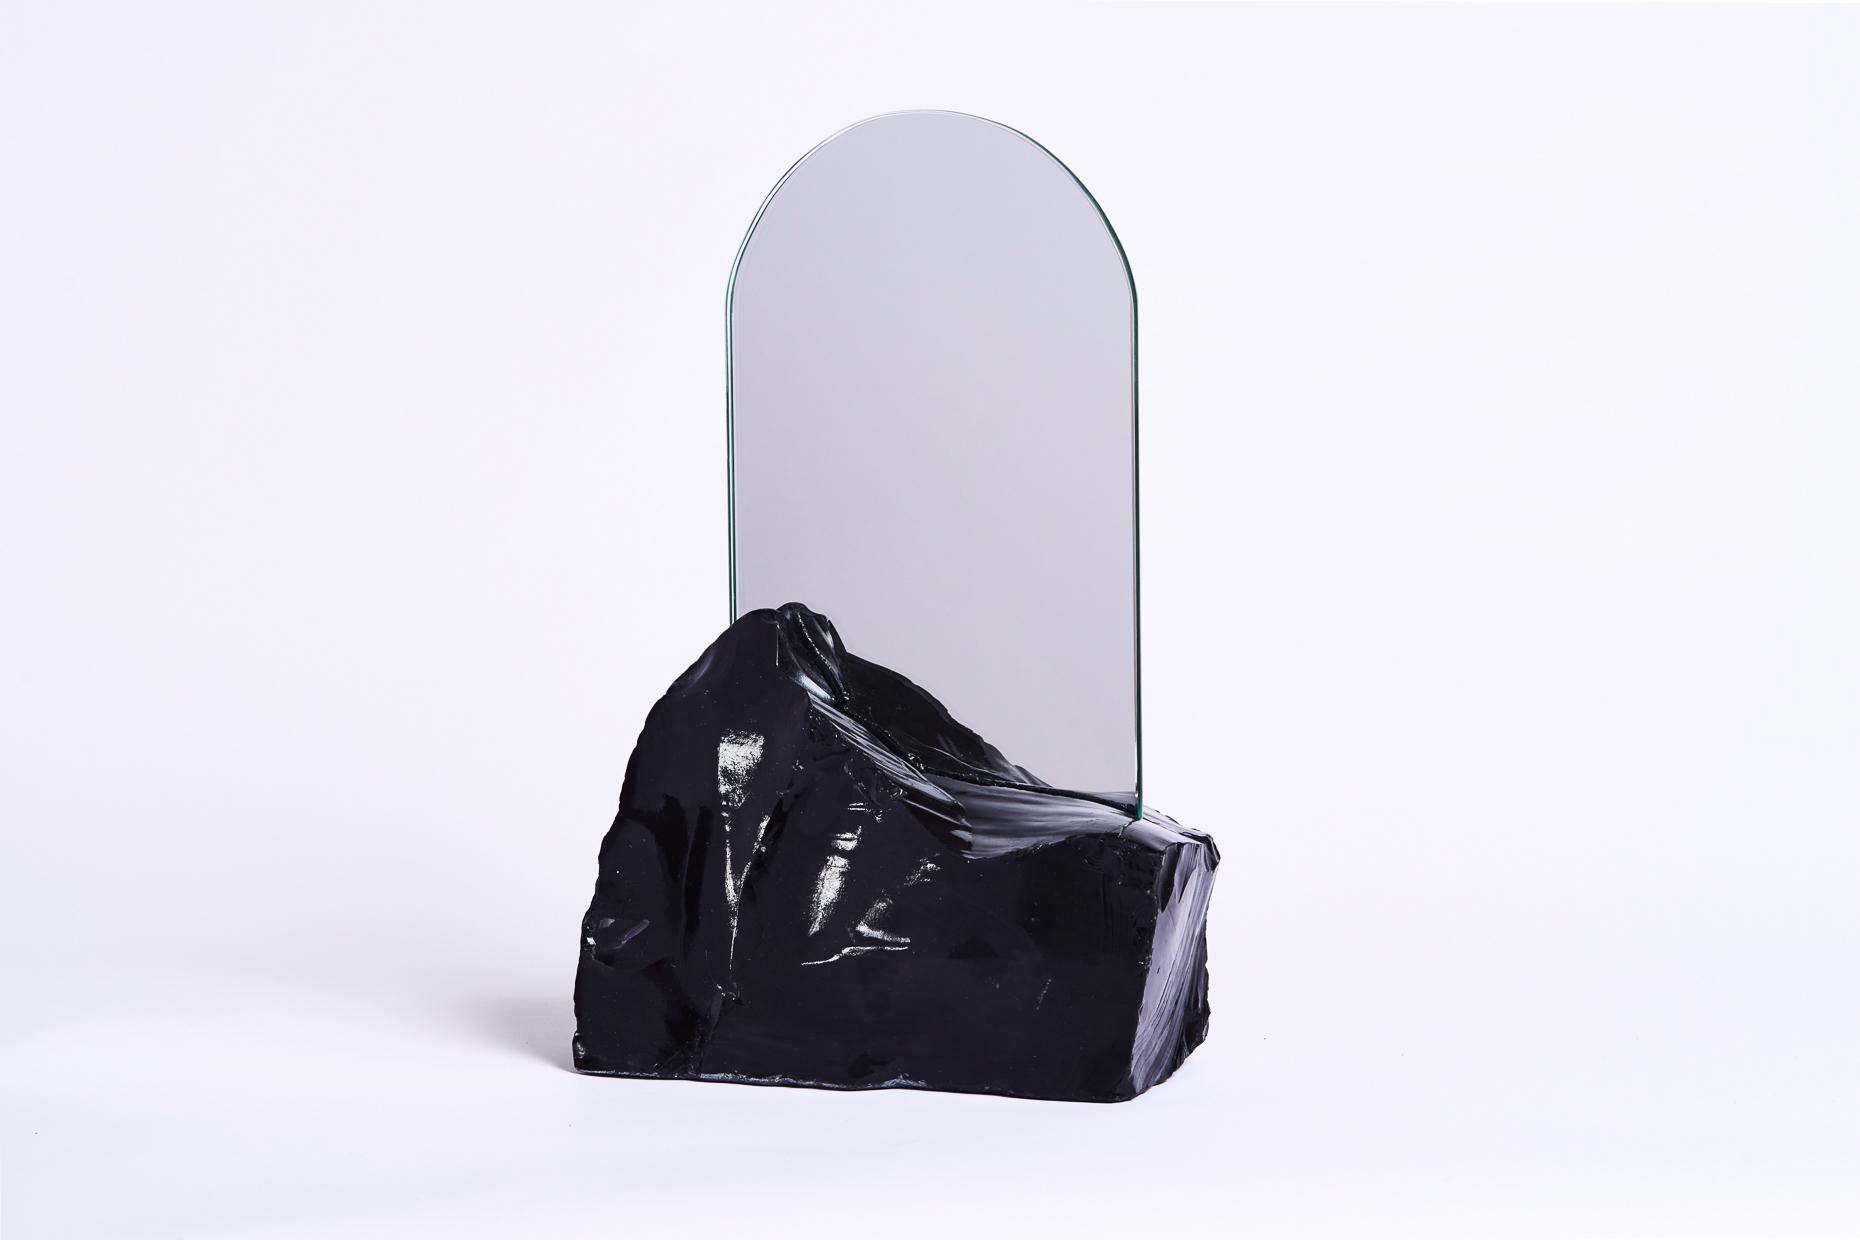 mirror+mirror_2.jpg